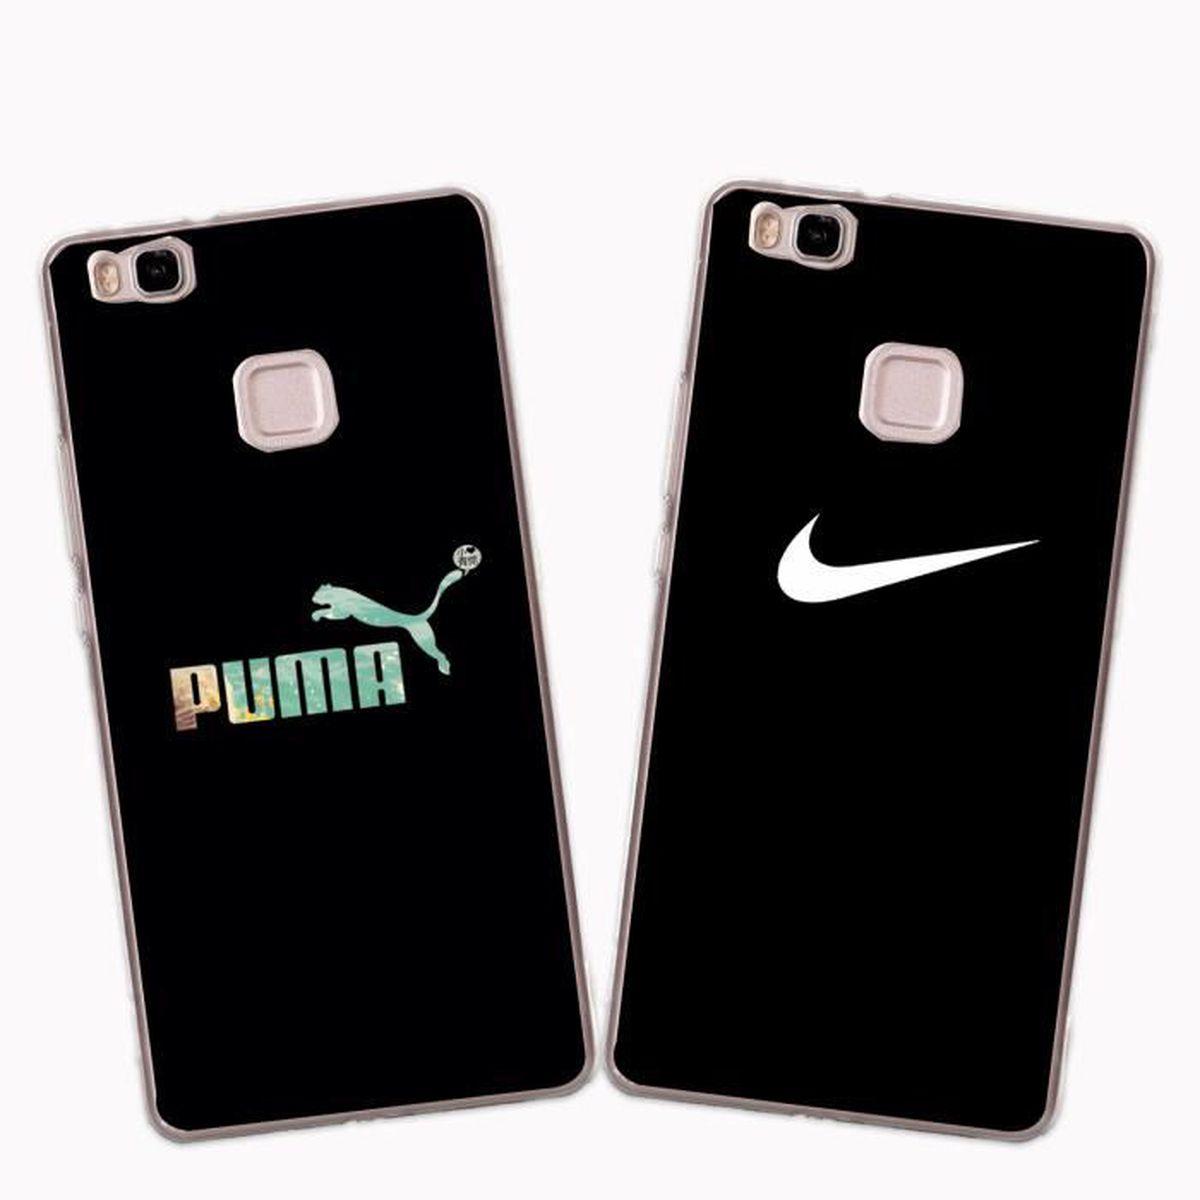 2 X Coque Huawei P9 Lite , Nike Doux Souple Transparent TPU Housse ...